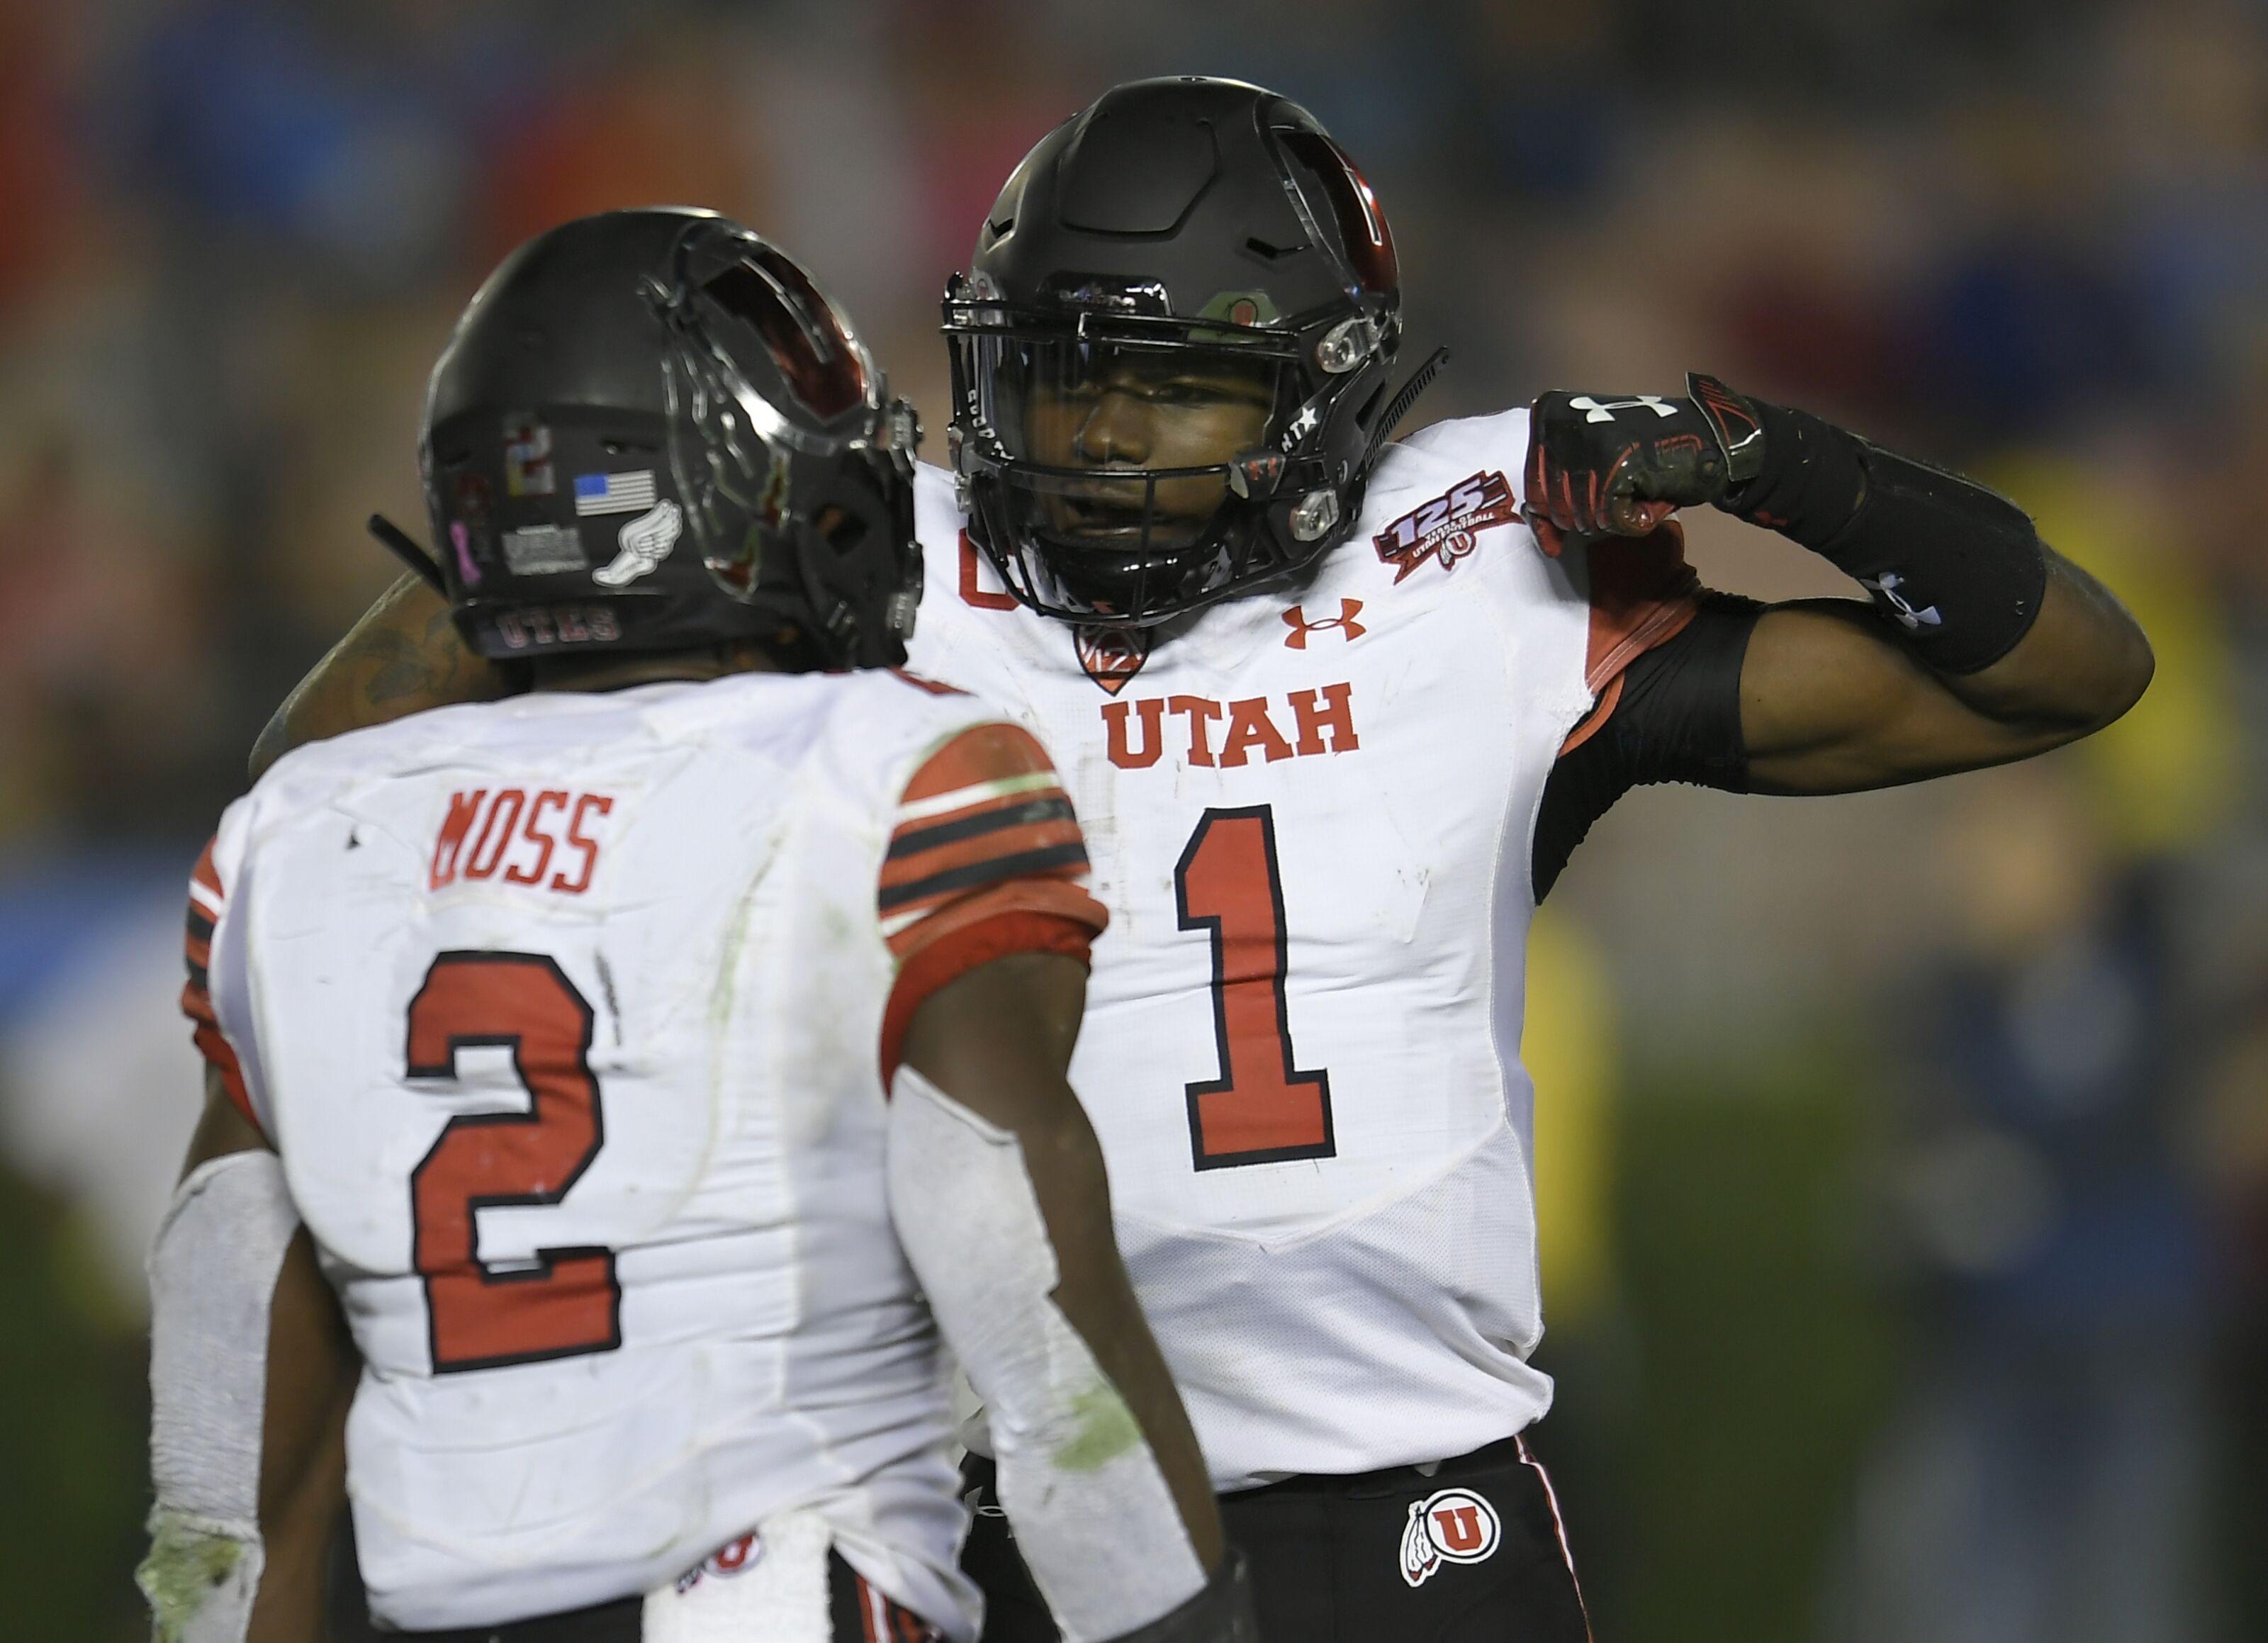 Utah Football: Are Utes a 2019 College Football Playoff sleeper?